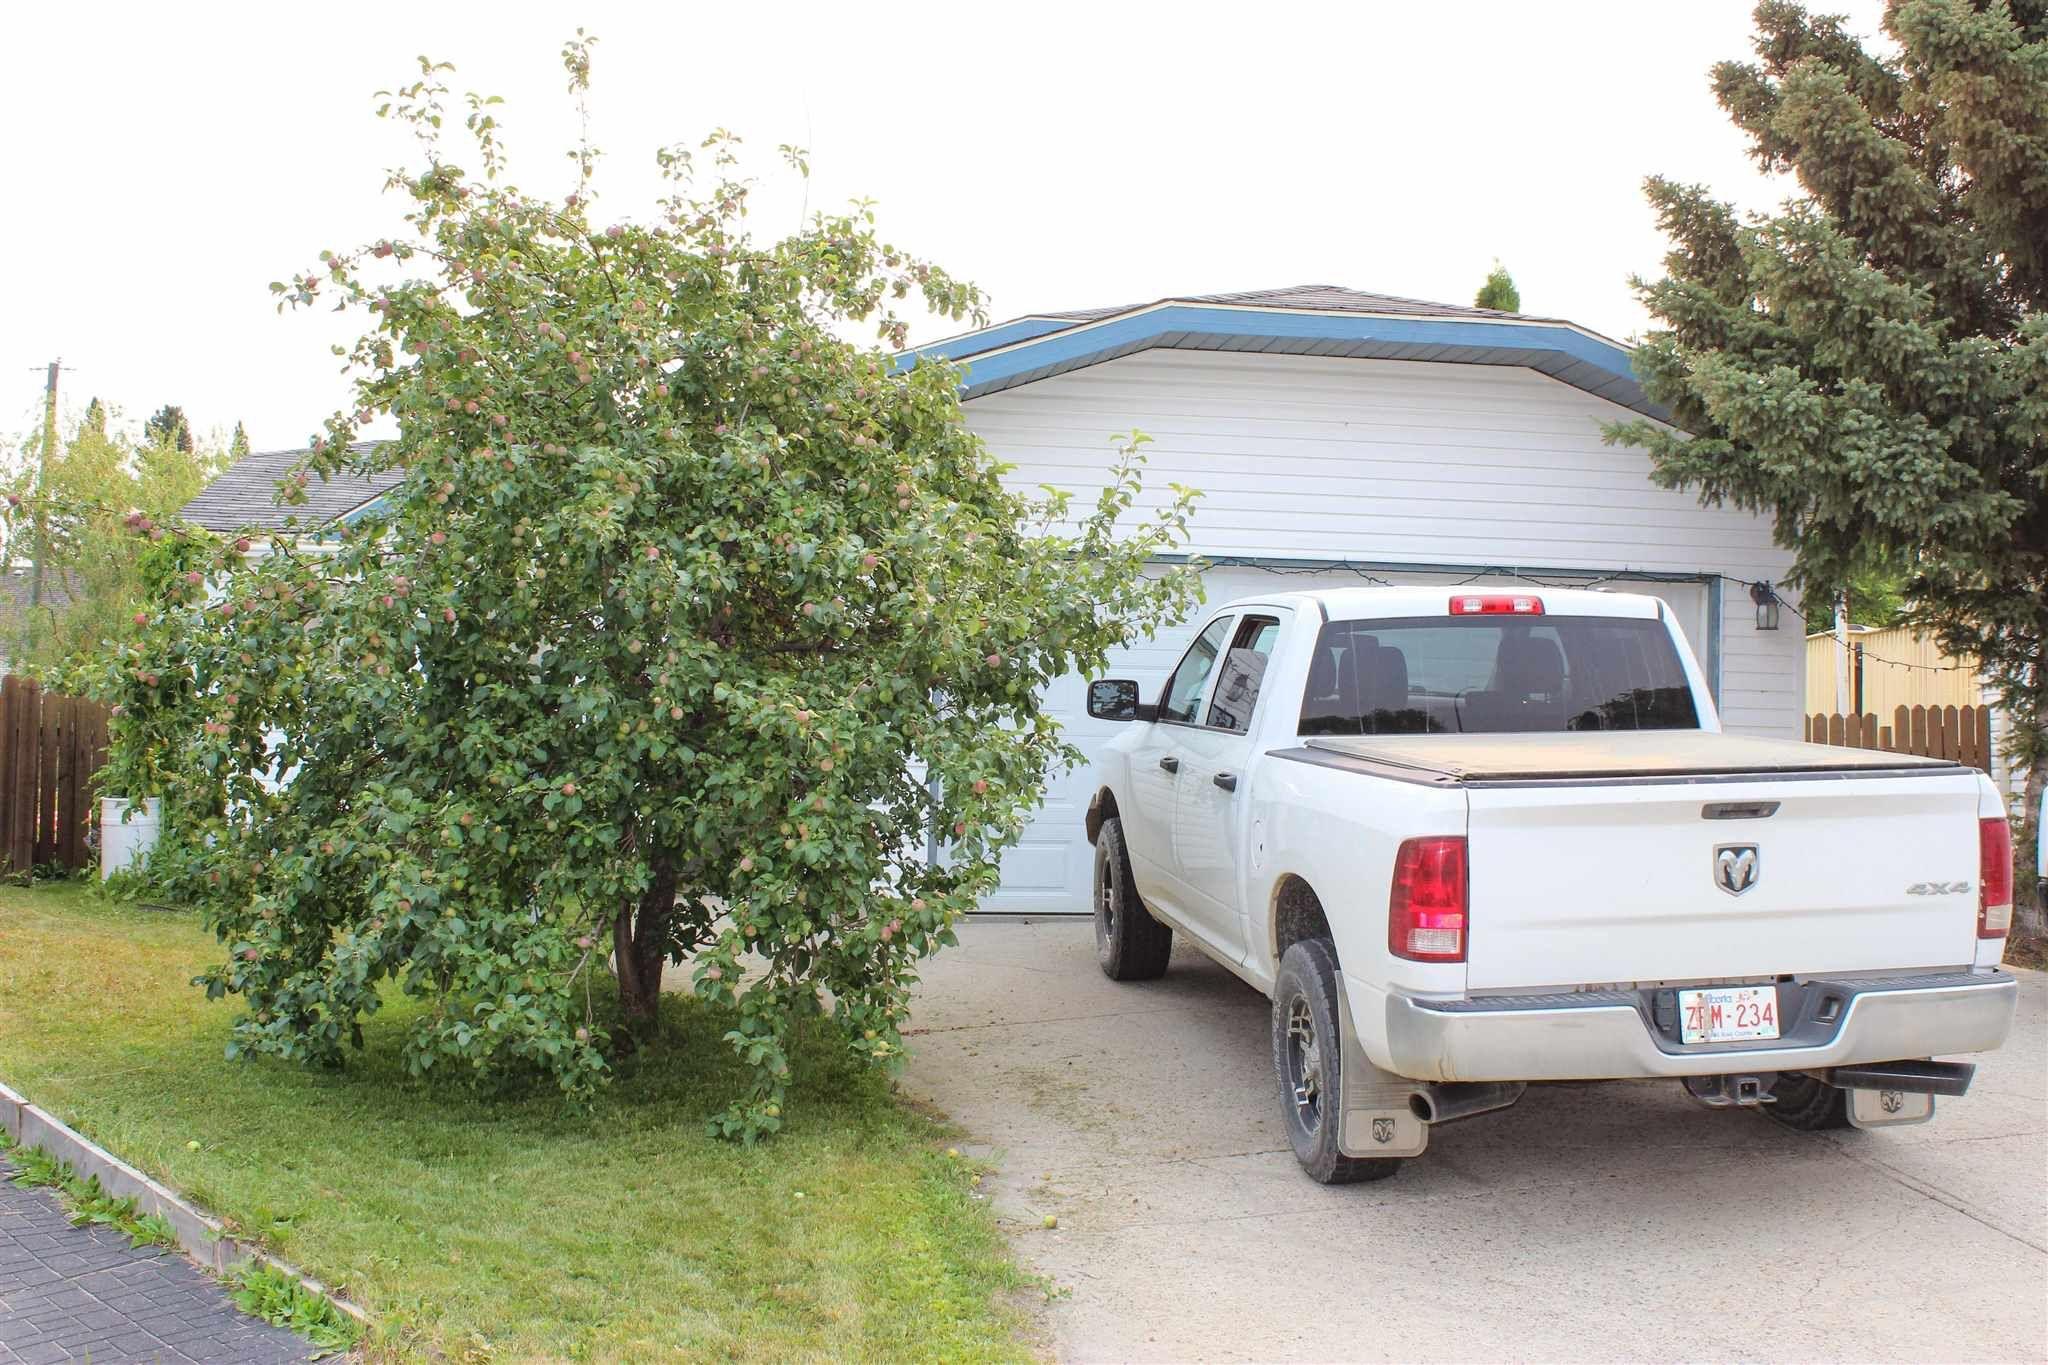 Main Photo: 4 9 Street Close: Cold Lake House for sale : MLS®# E4257035